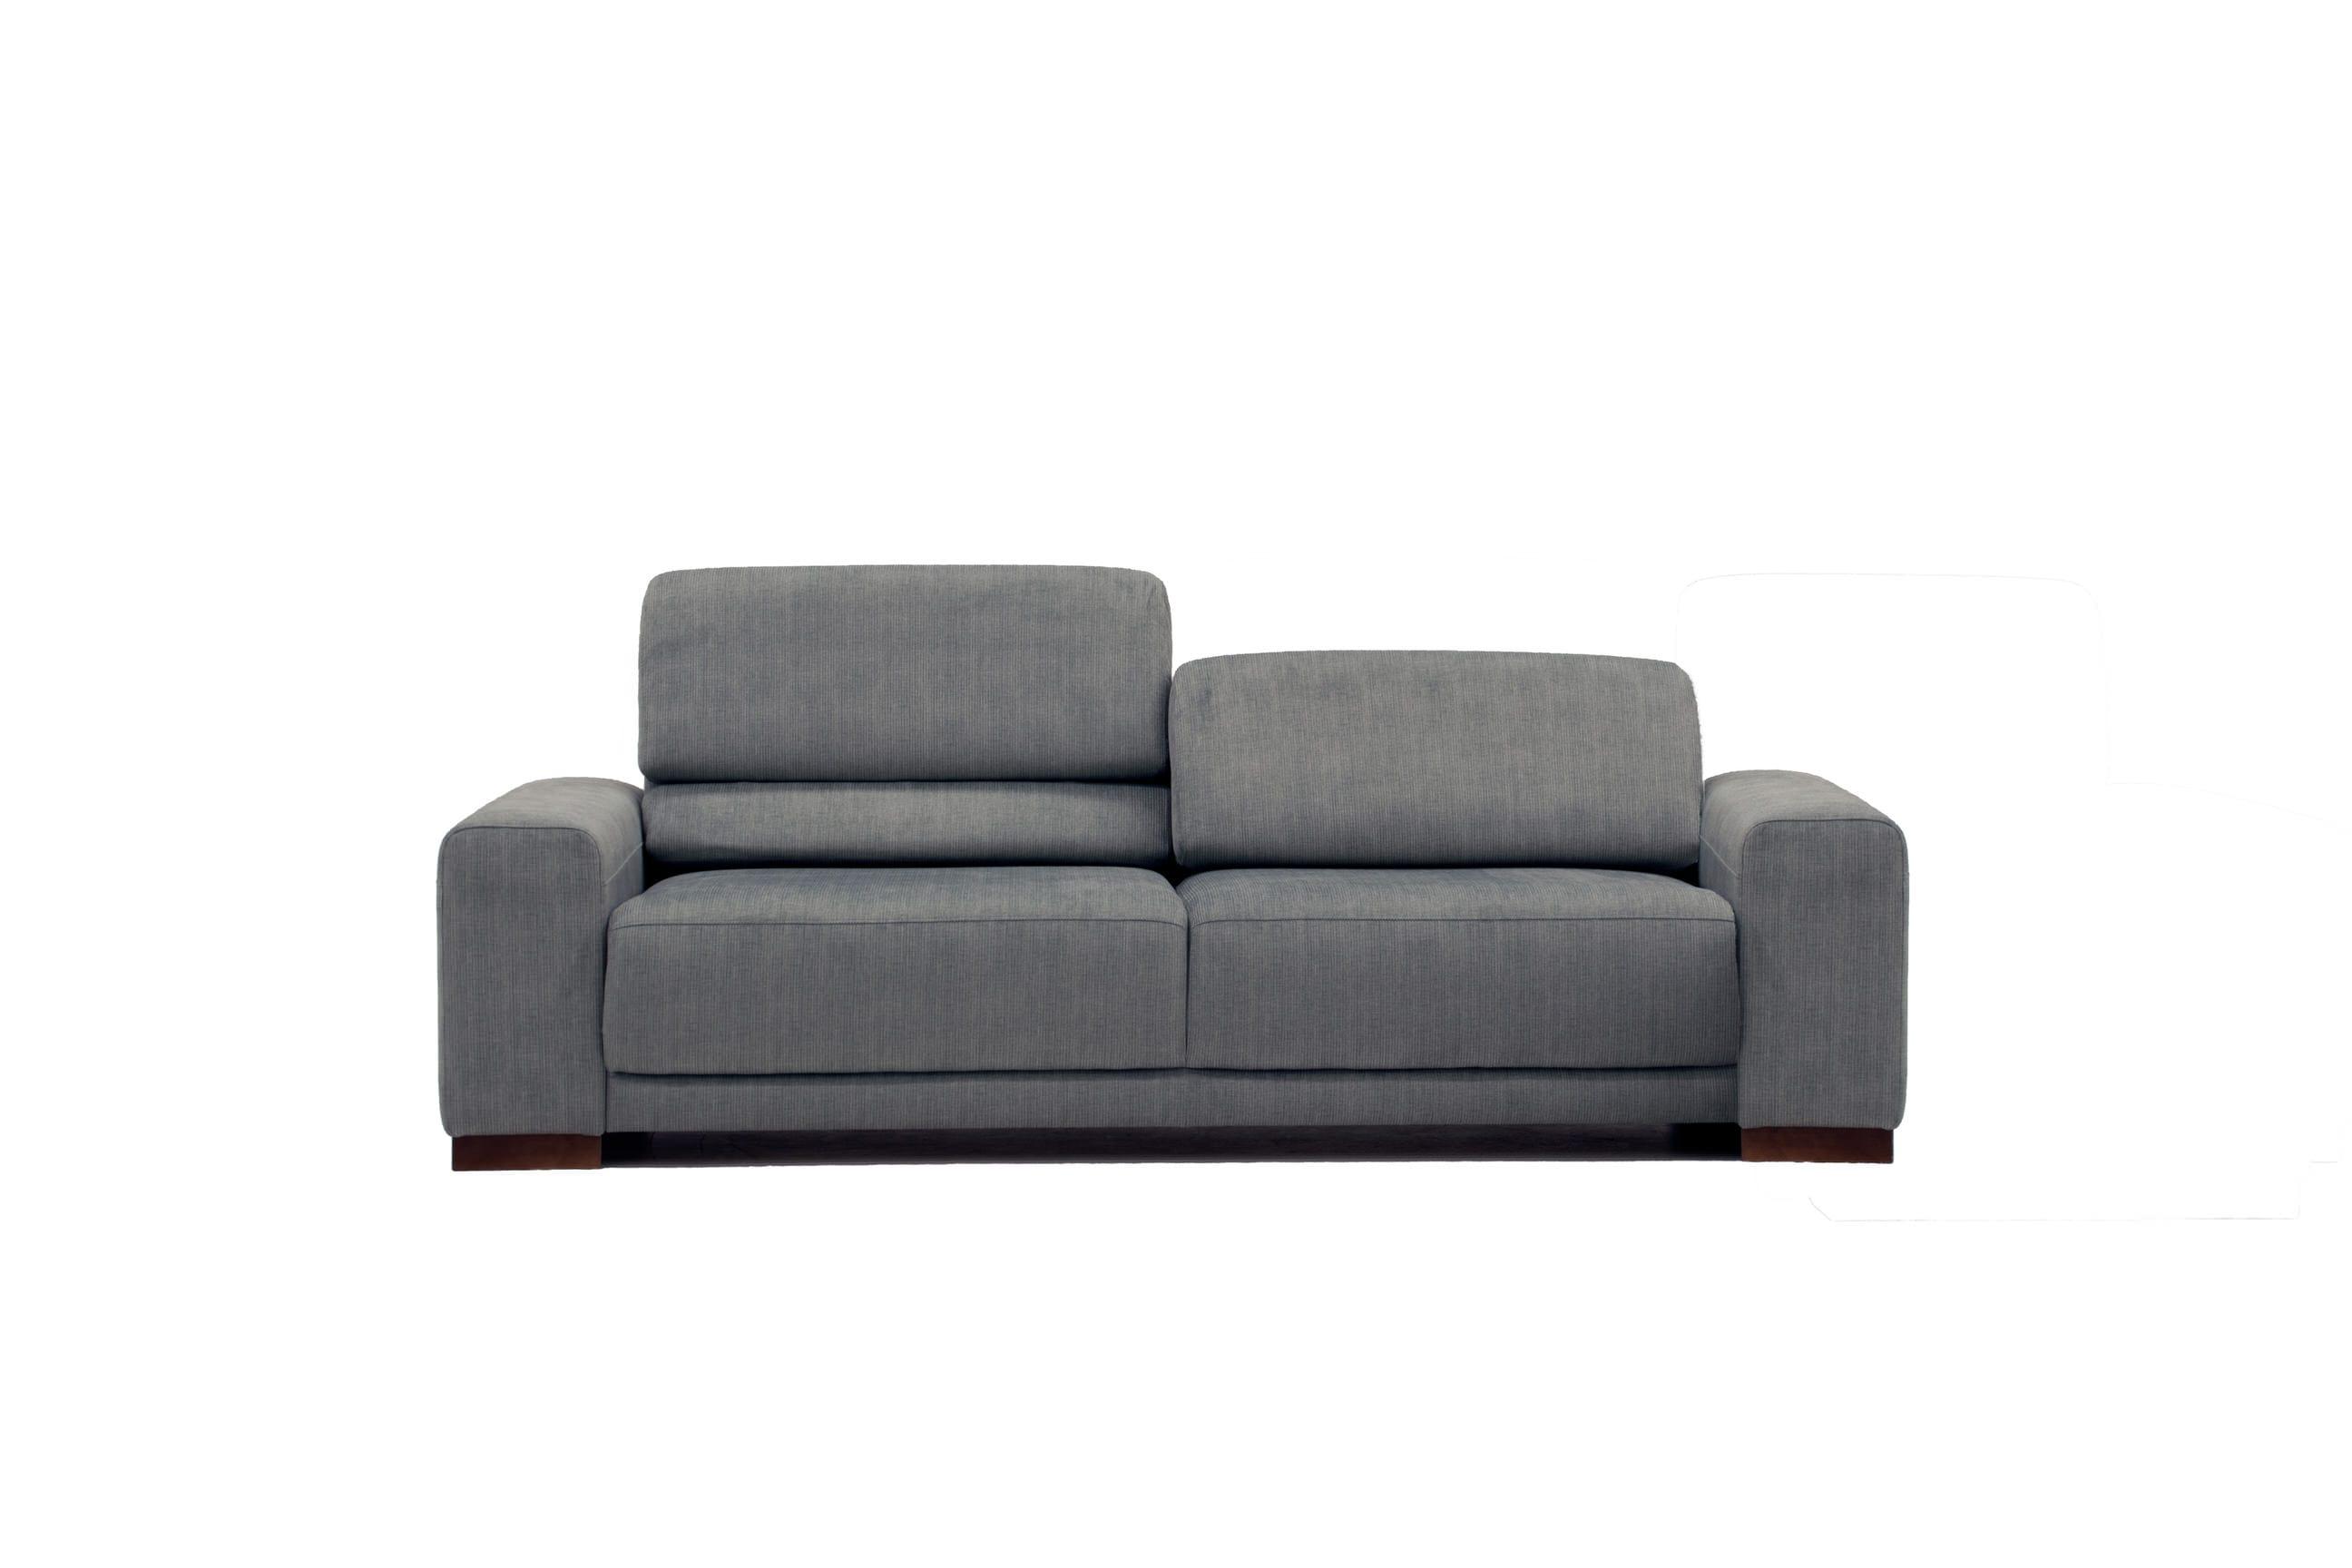 Copenhagen Sofa Sleeper Full Xl Size By Luonto Furniture